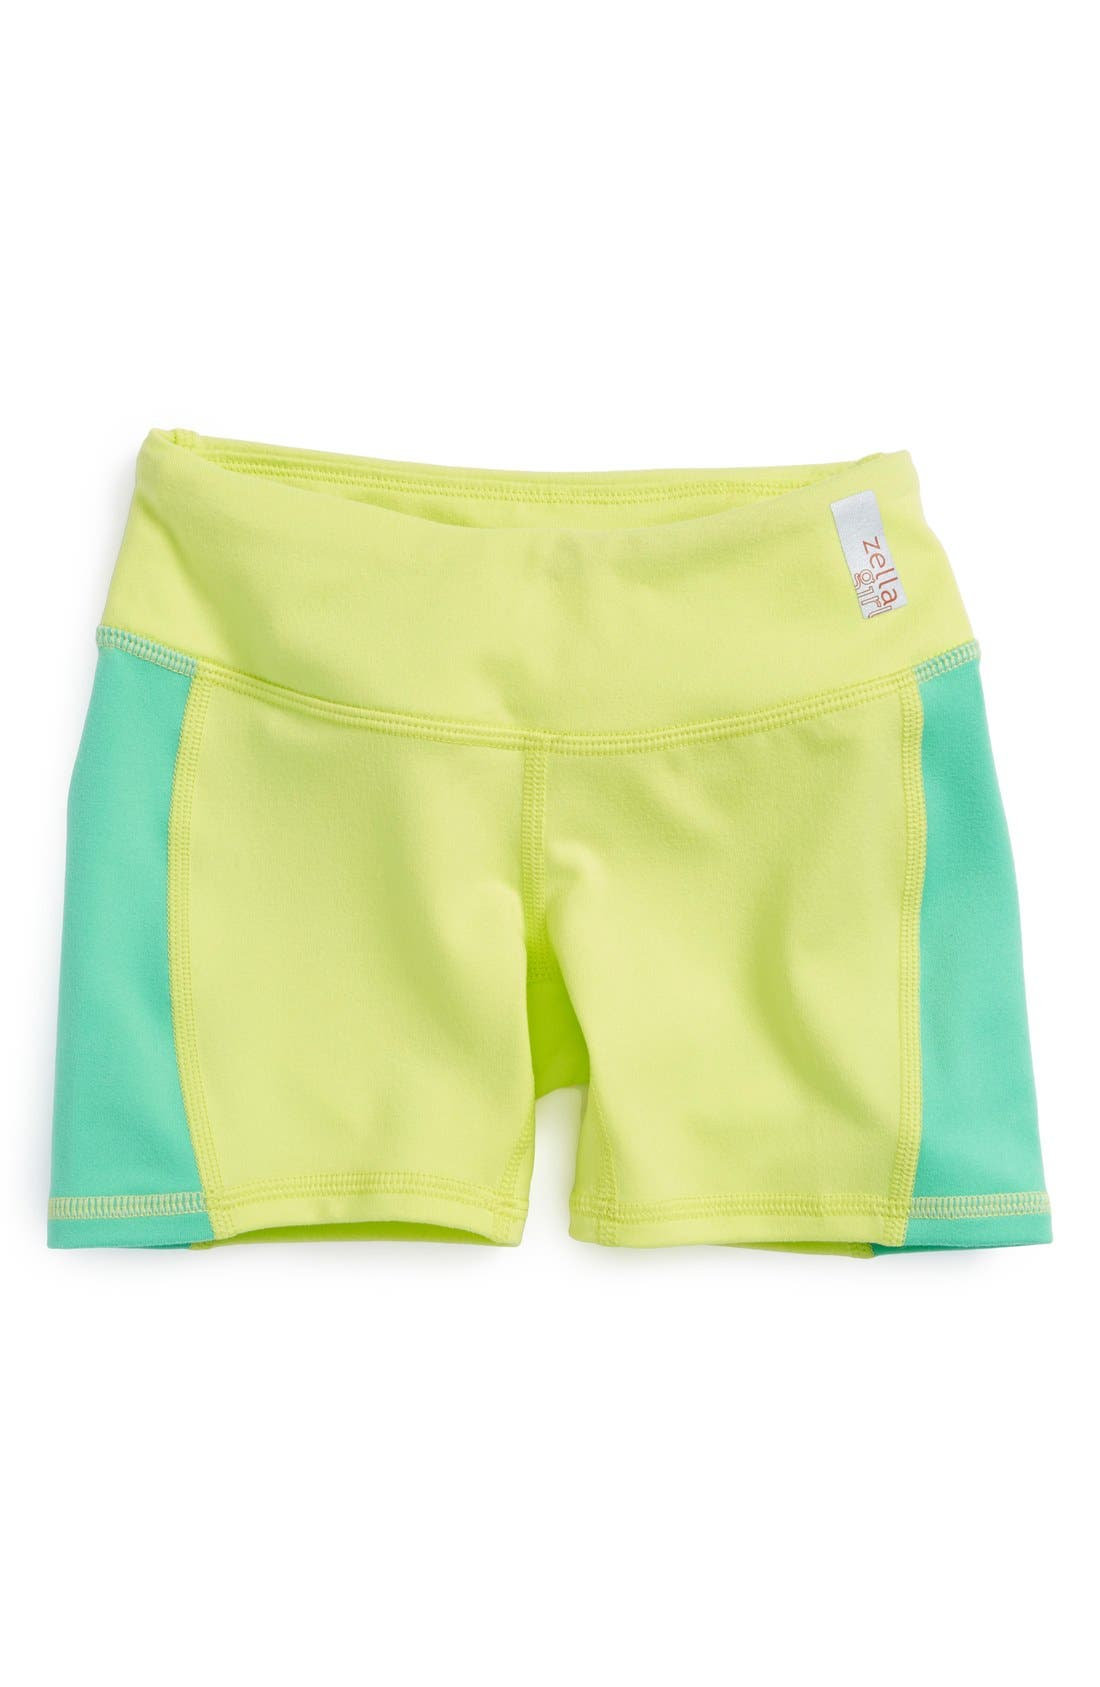 Alternate Image 1 Selected - Zella Girl 'Kinetic' Shorts (Little Girls & Big Girls)